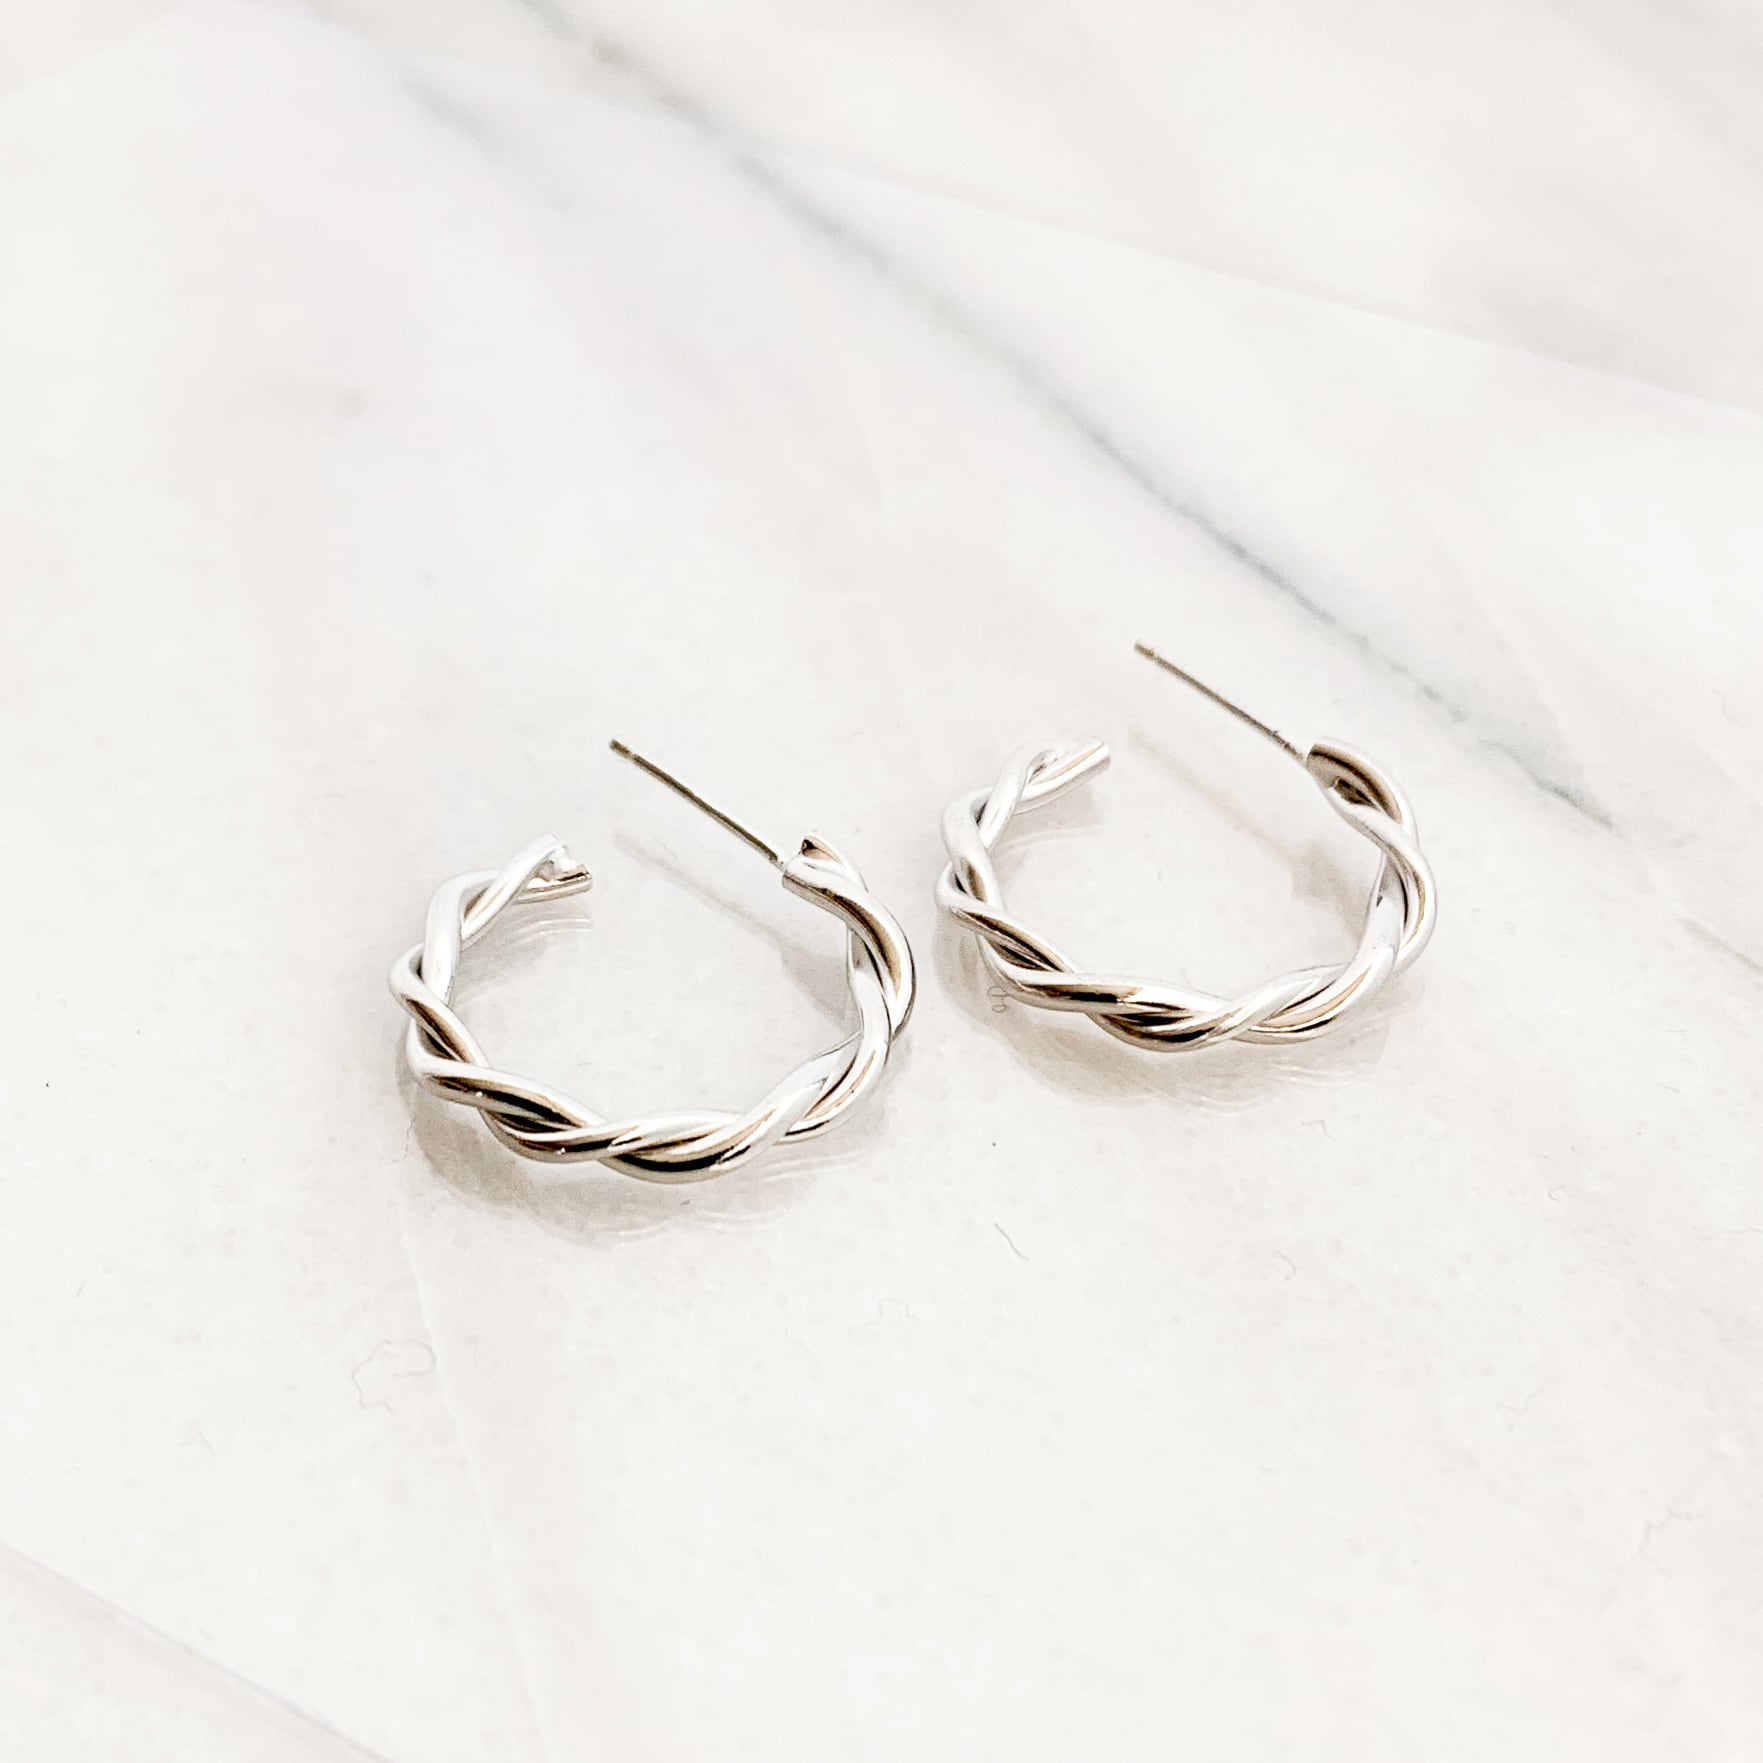 sv925 Silver Twist Hoop Pierce